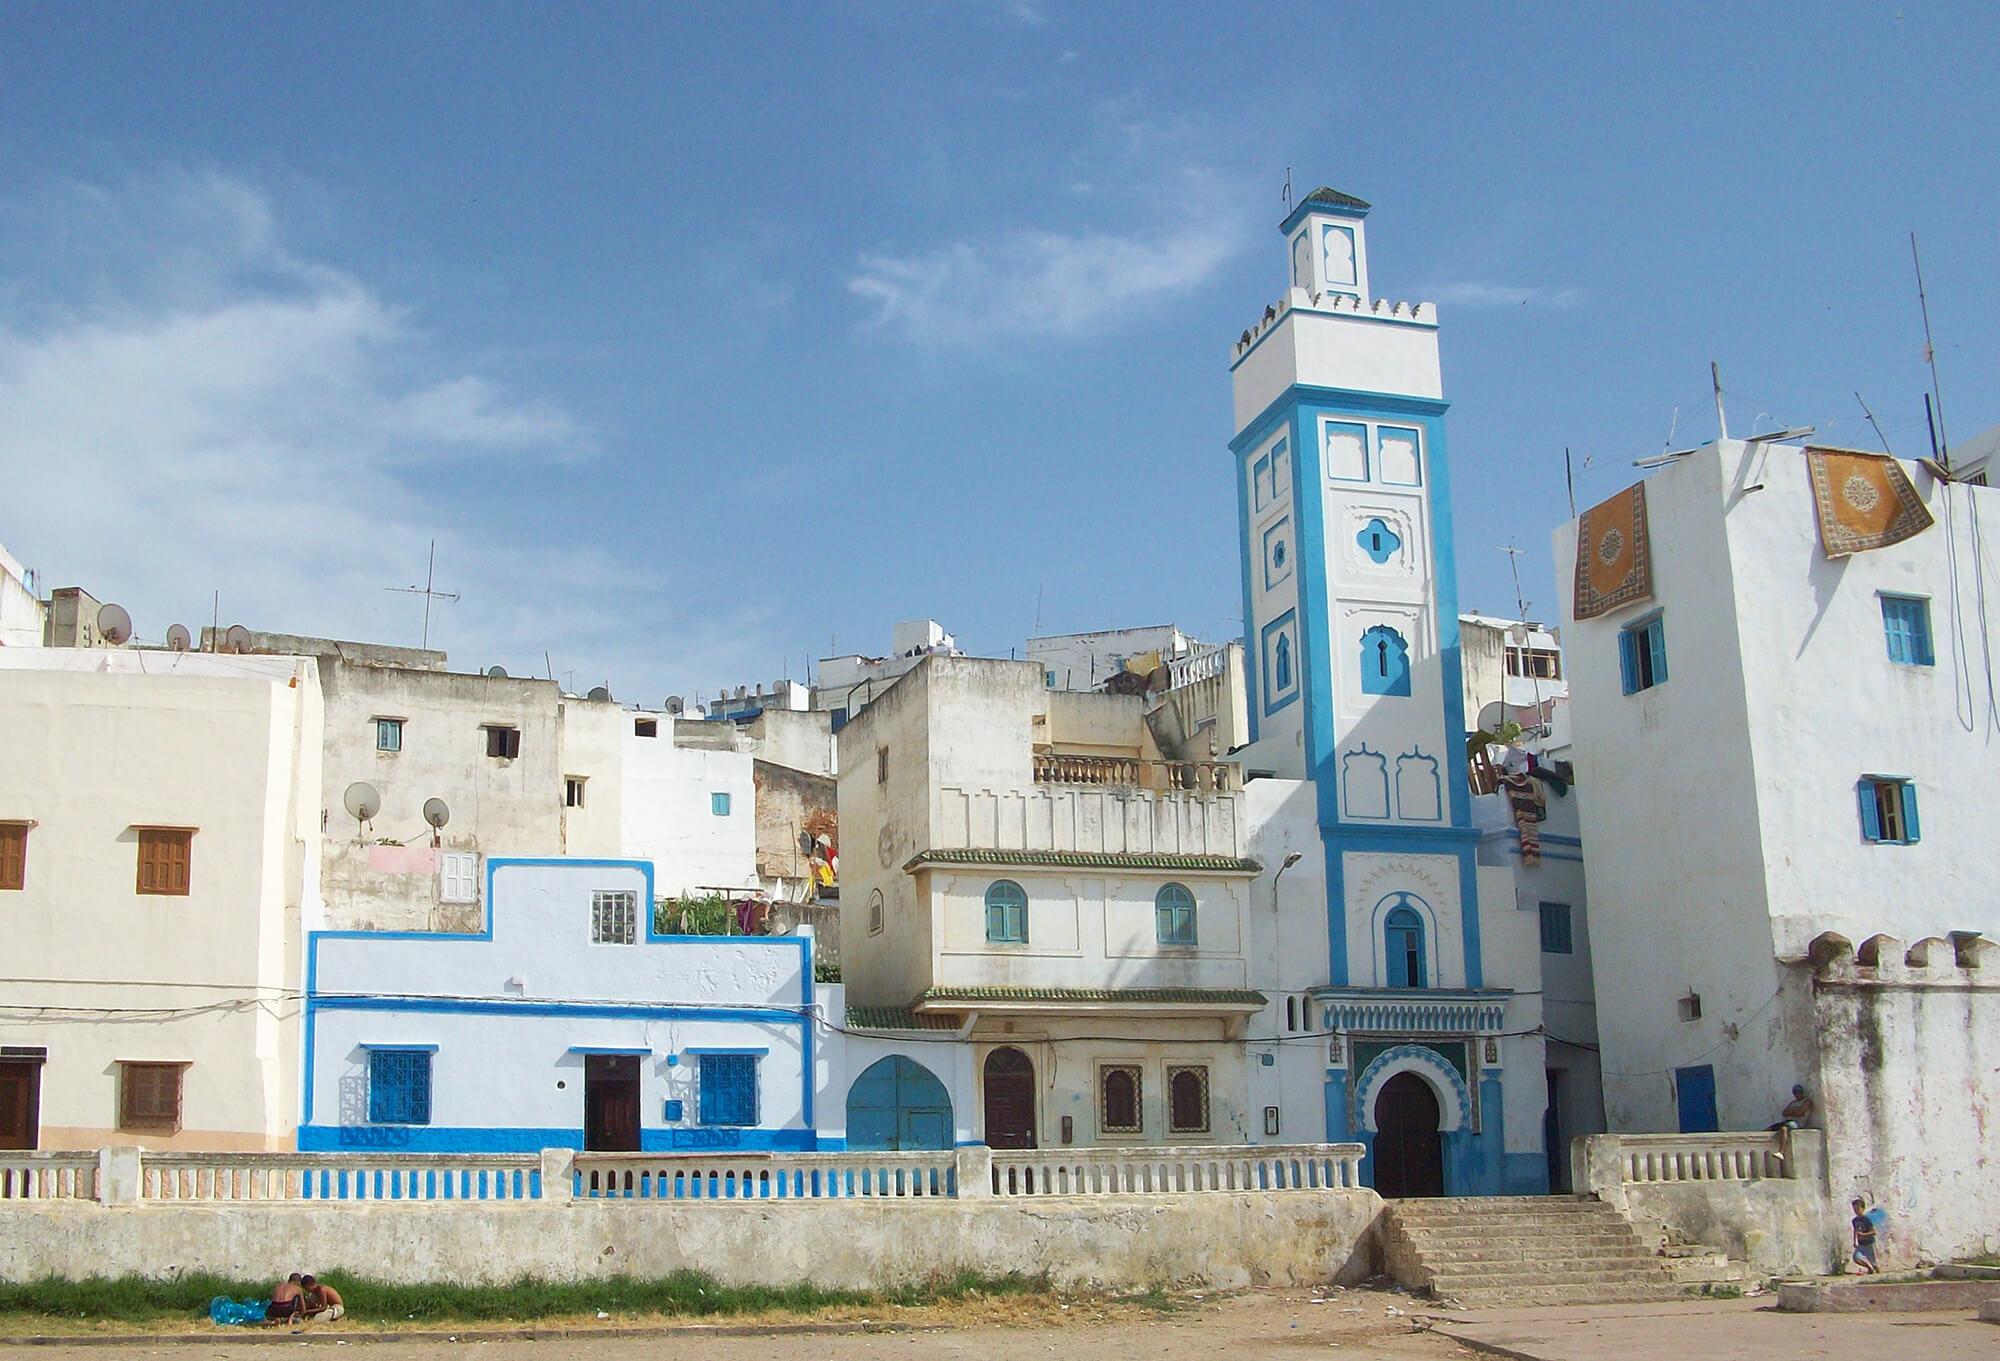 Sahara Desert Tour - Small Moroccan Towns Worth Exploring - Larache